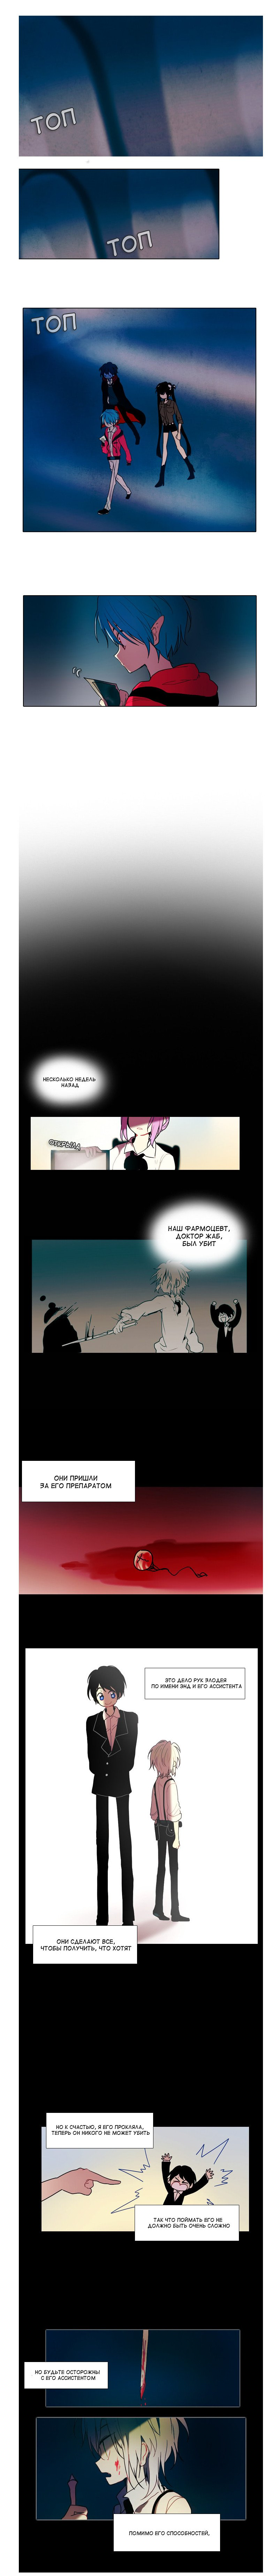 Манга Конец и Спасение - Глава 24 Страница 1